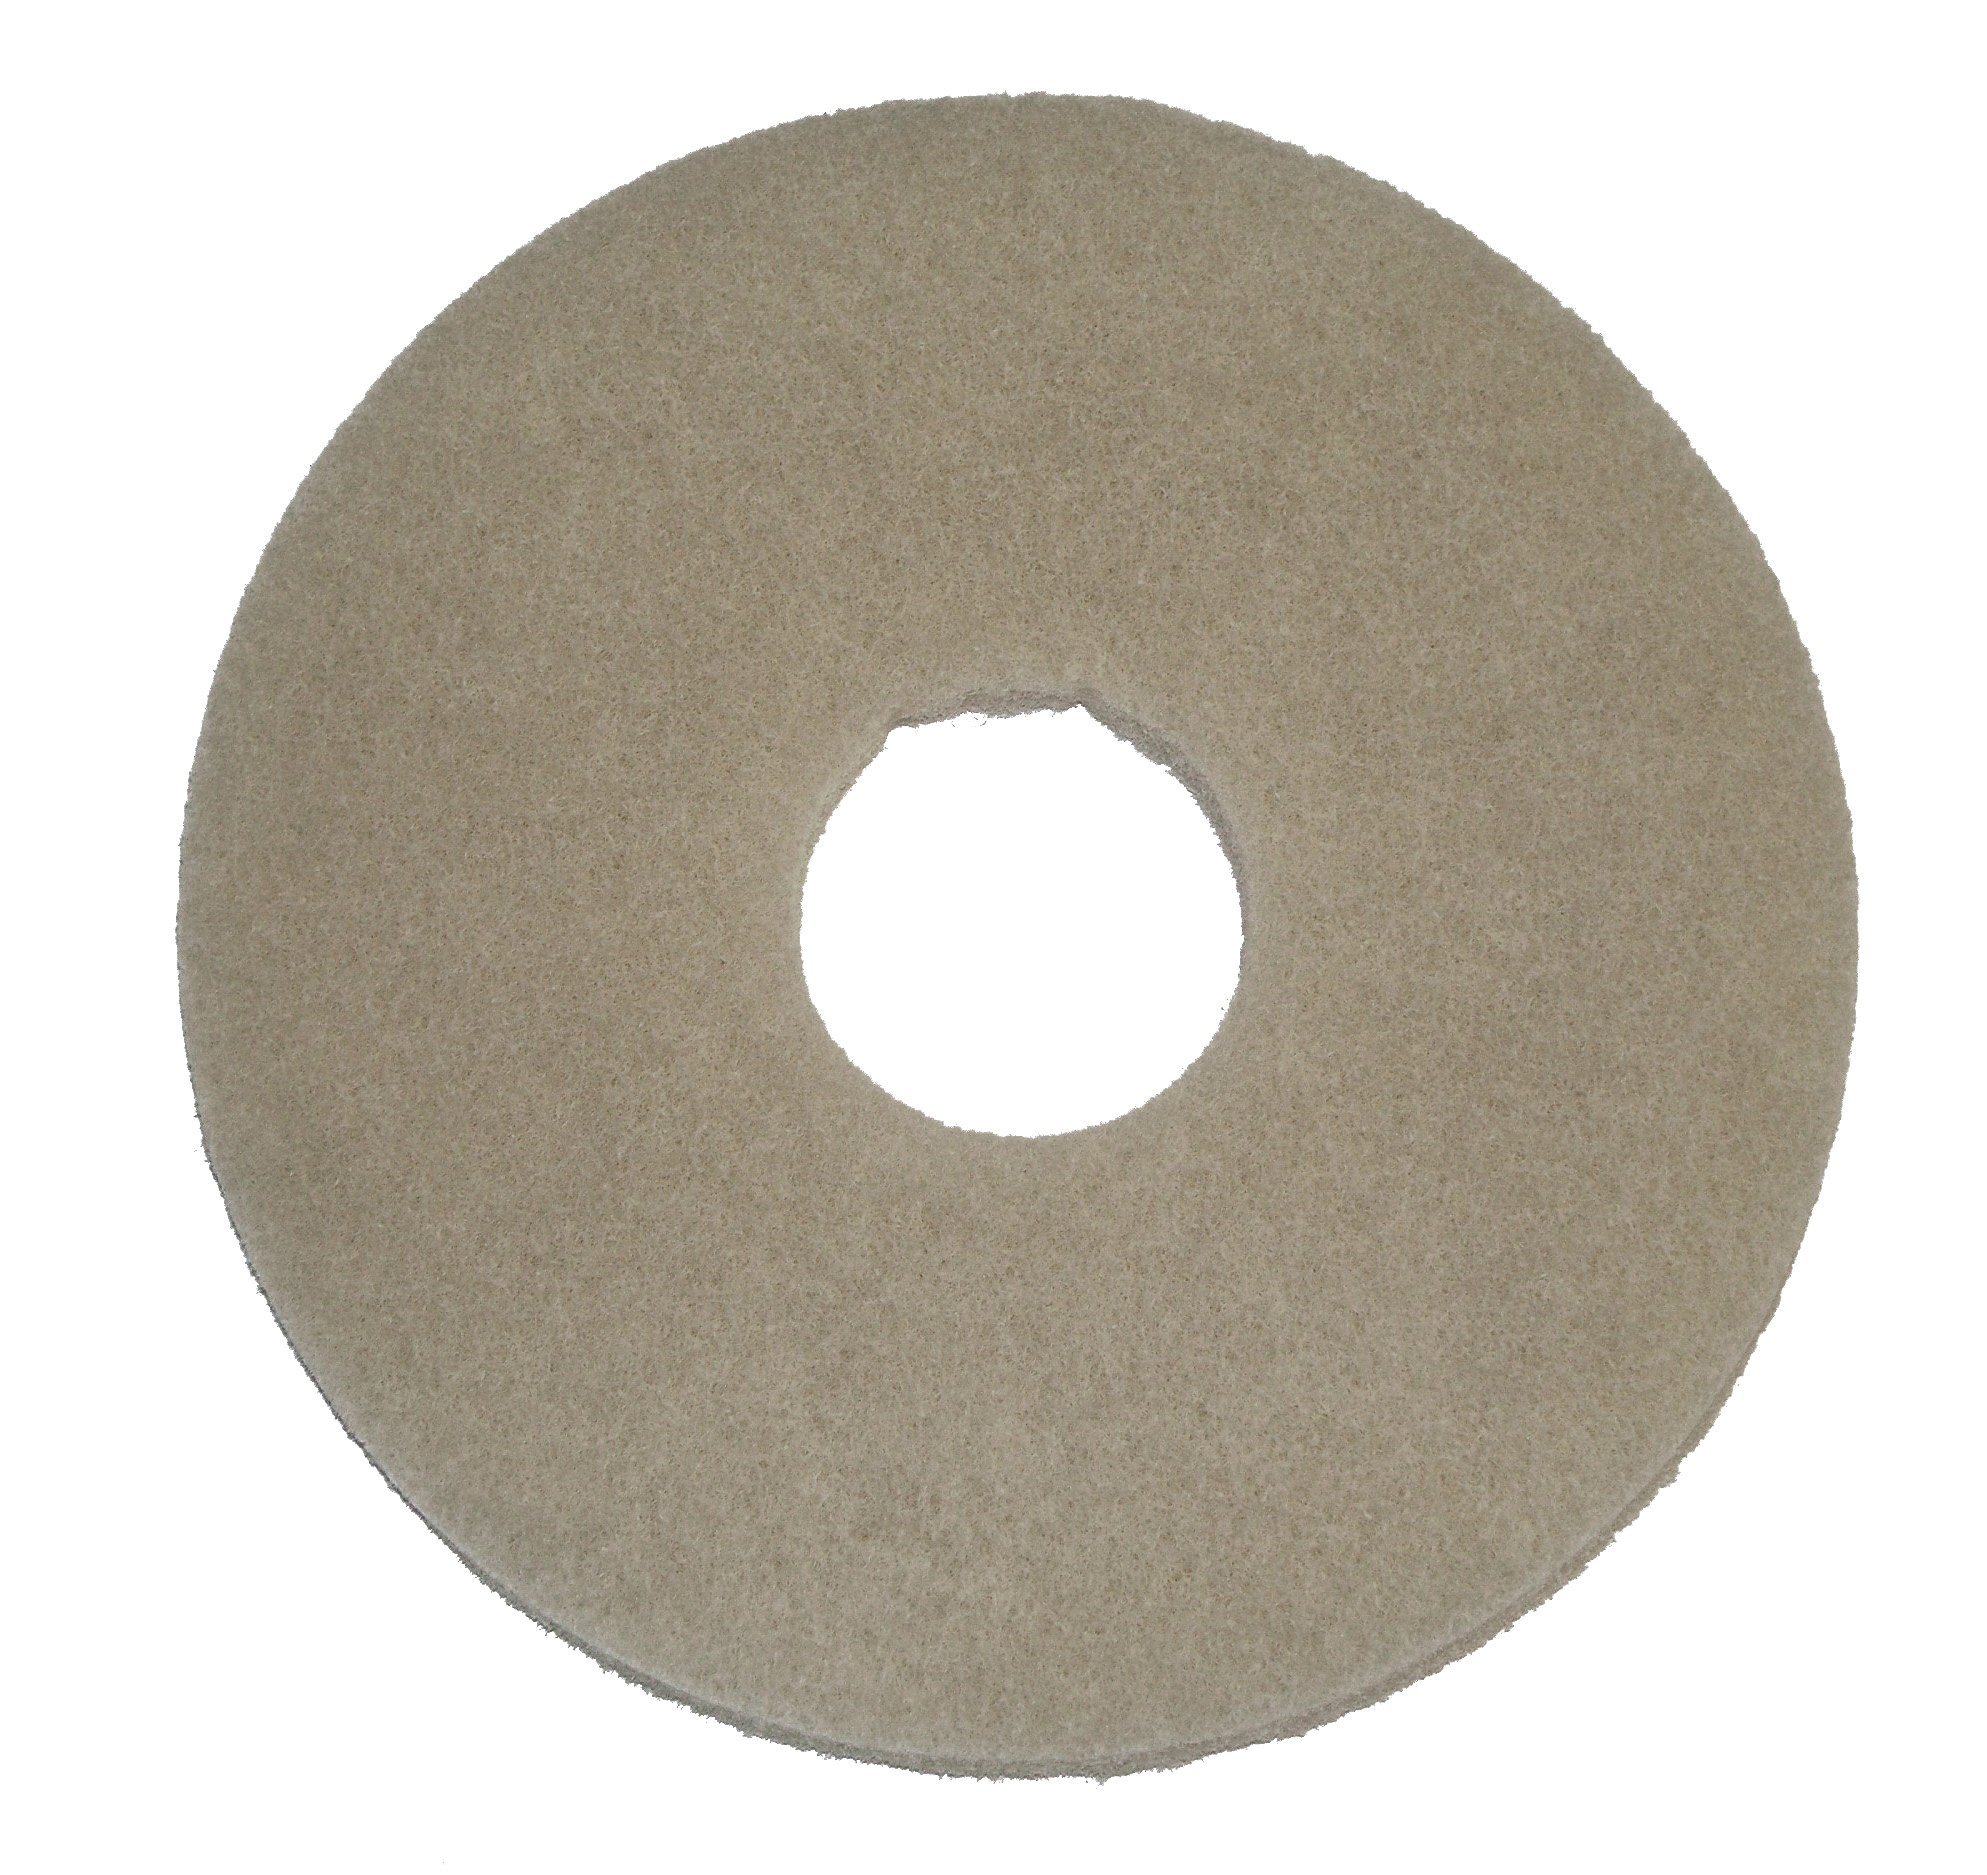 BISSELL BigGreen Commercial 437.049BG-C Scrub Pad for BGEM9000 Easy Motion Floor Machine, 12'', Brown (Pack of 5)